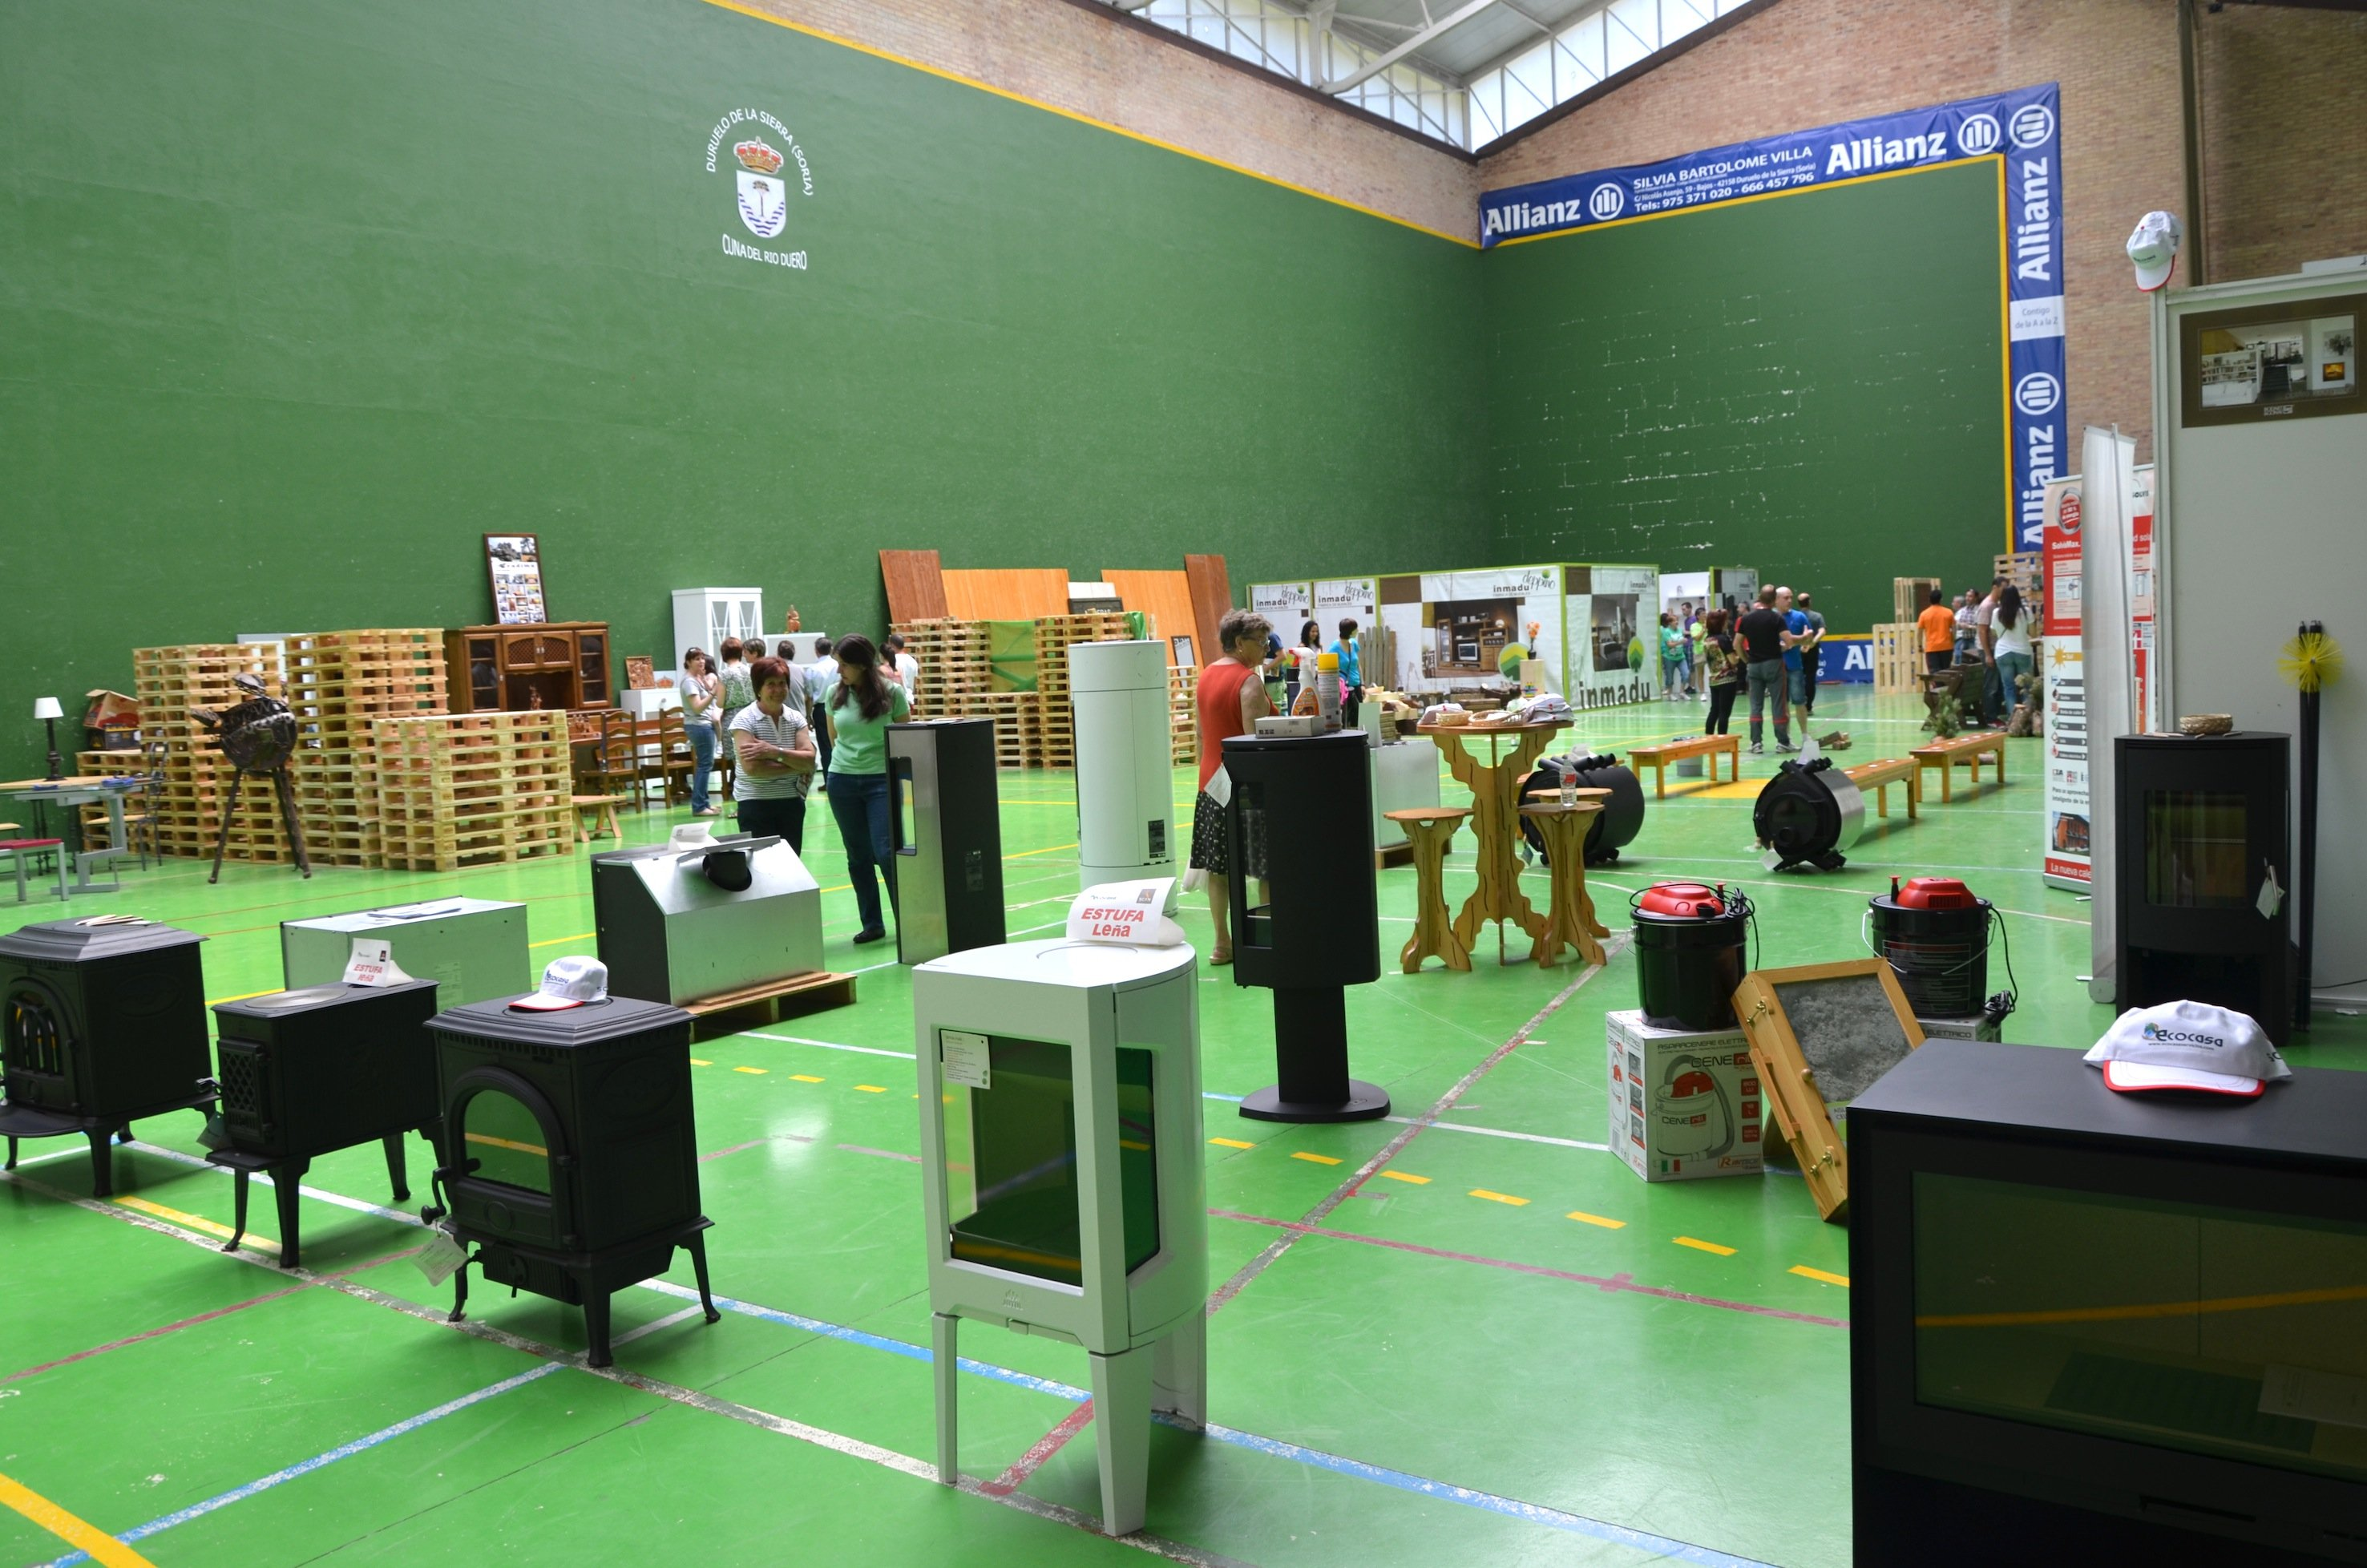 Duruelo Presenta La Tercera Edici N De Durufema La Feria De La  # Muebles Duruelo De La Sierra